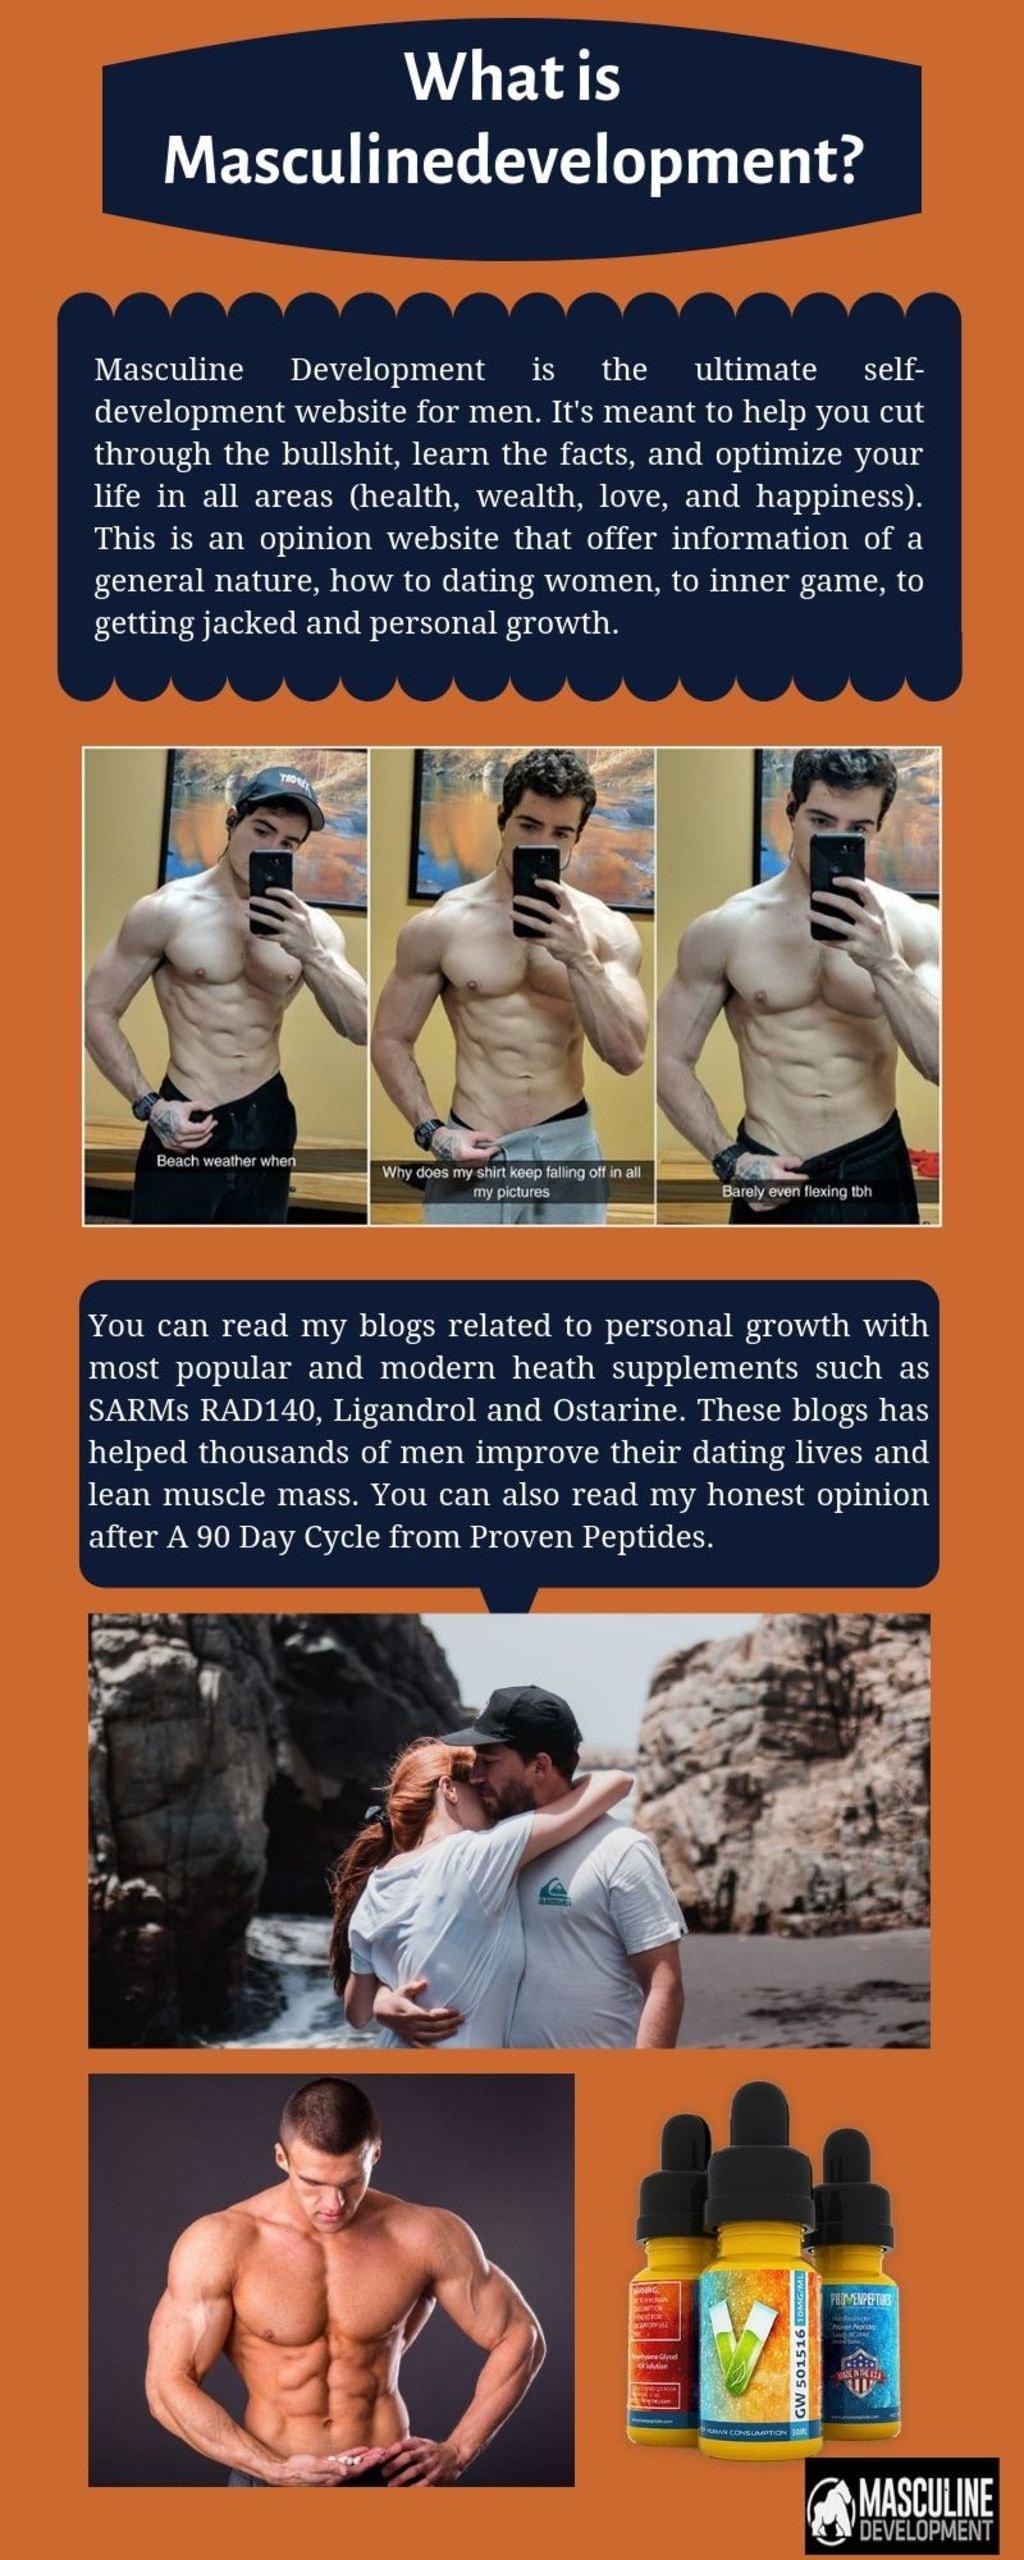 Get Information About Modern SARMs - Masculinedevelopment via Masculine Development